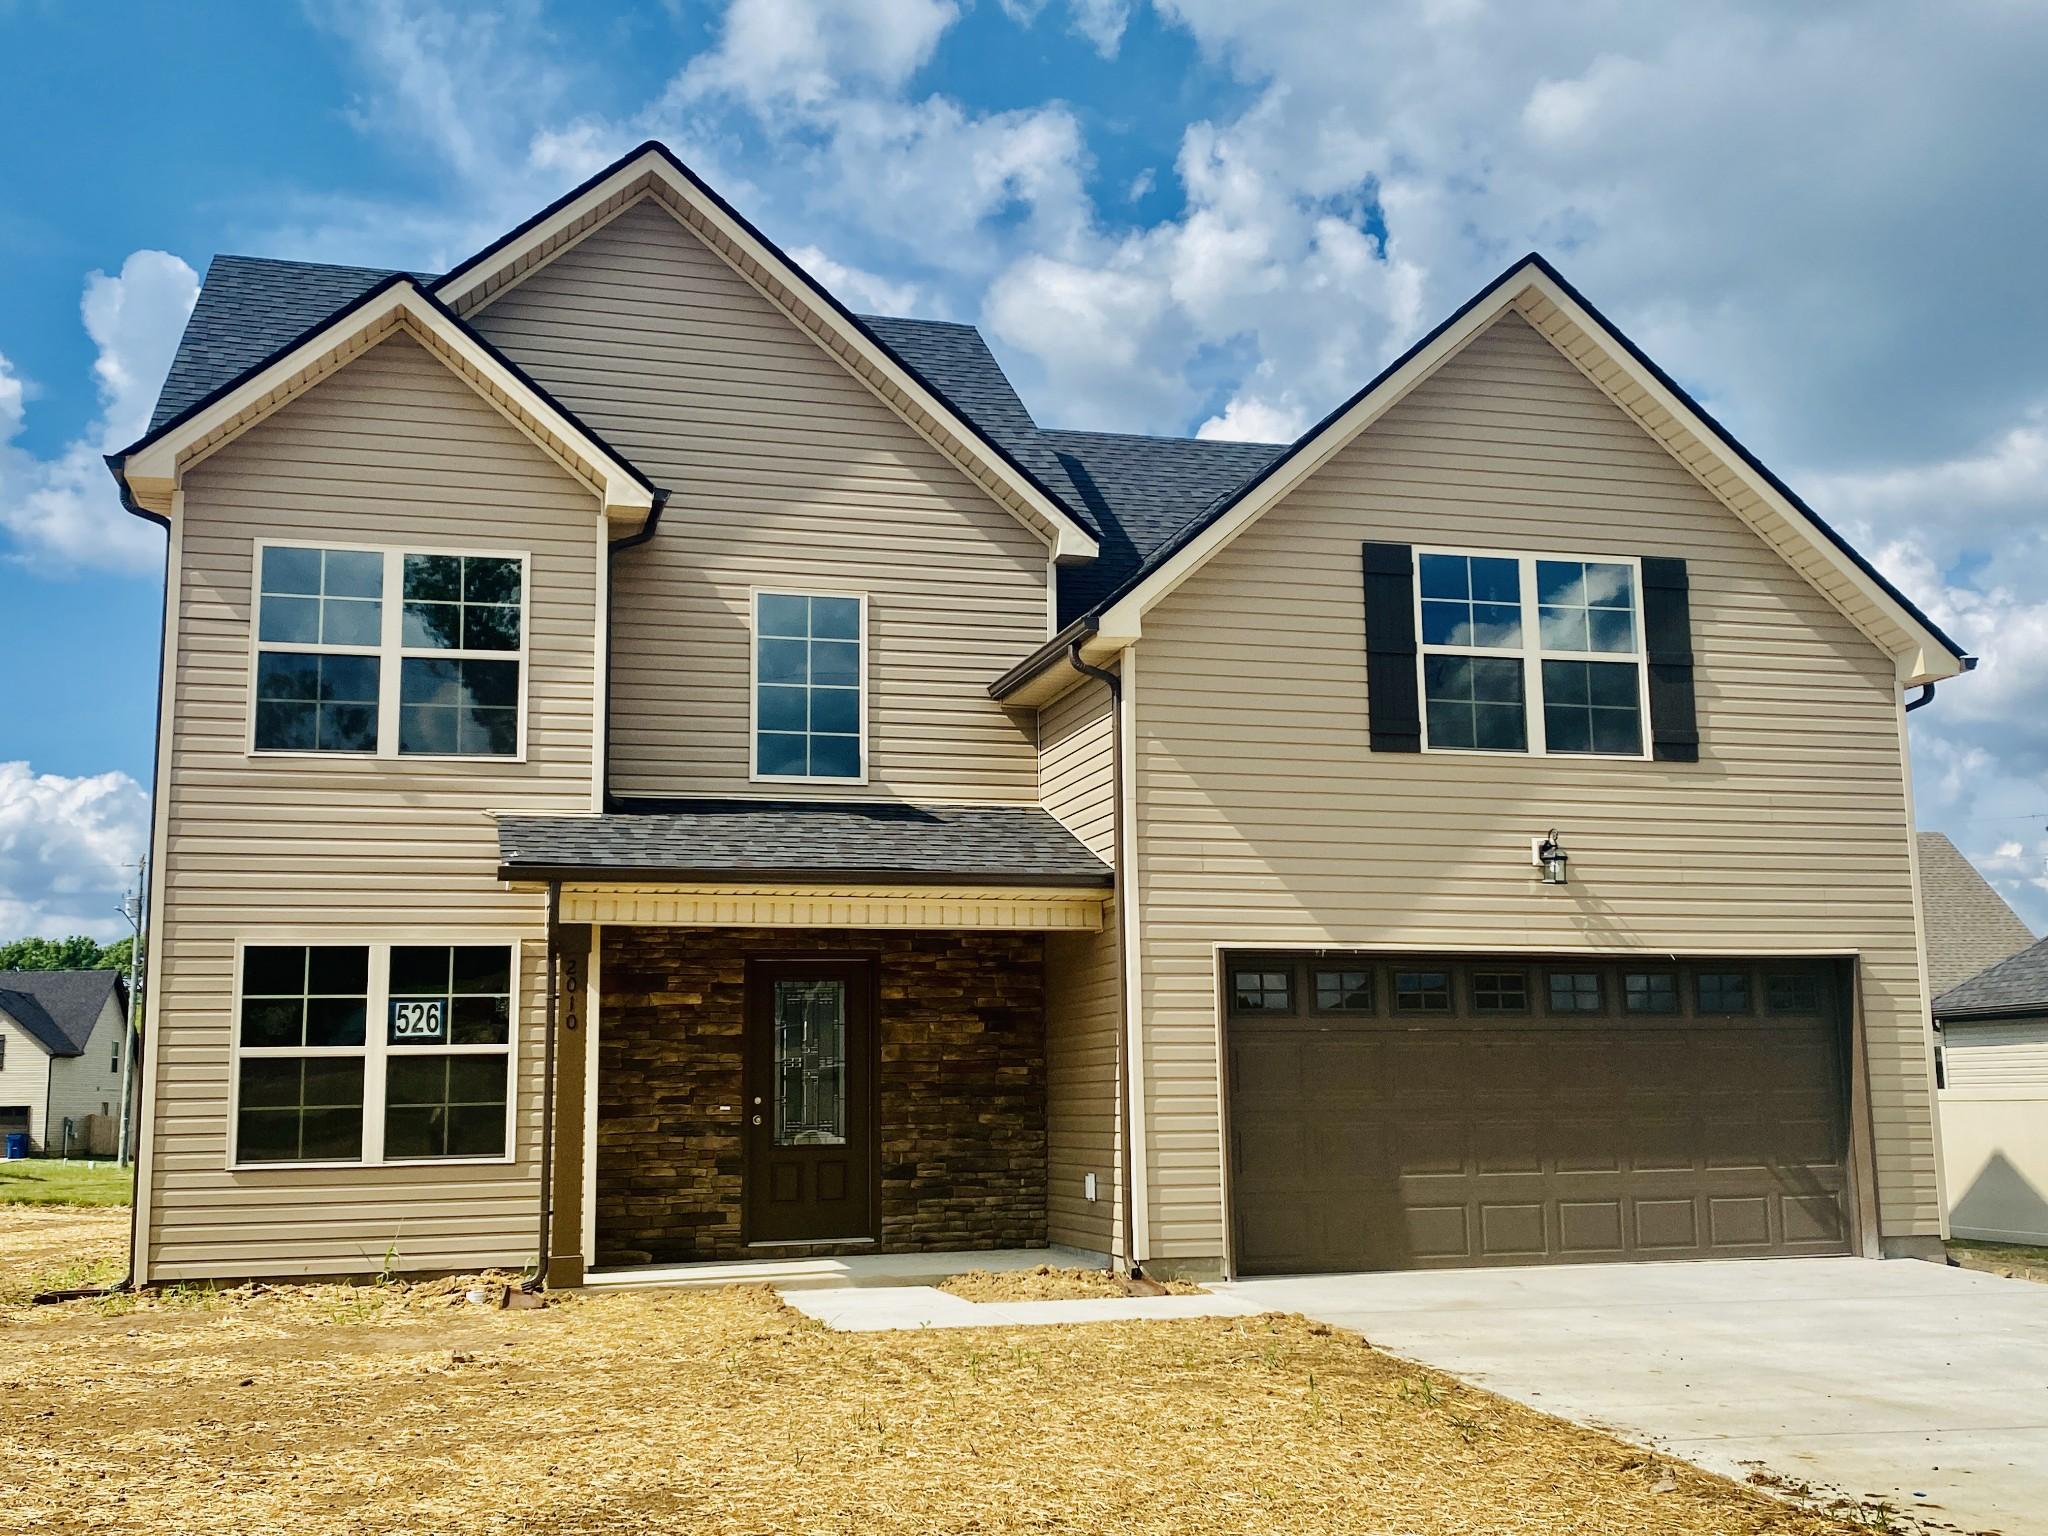 2010 Hackensack Ln, Property Photo - Smyrna, TN real estate listing